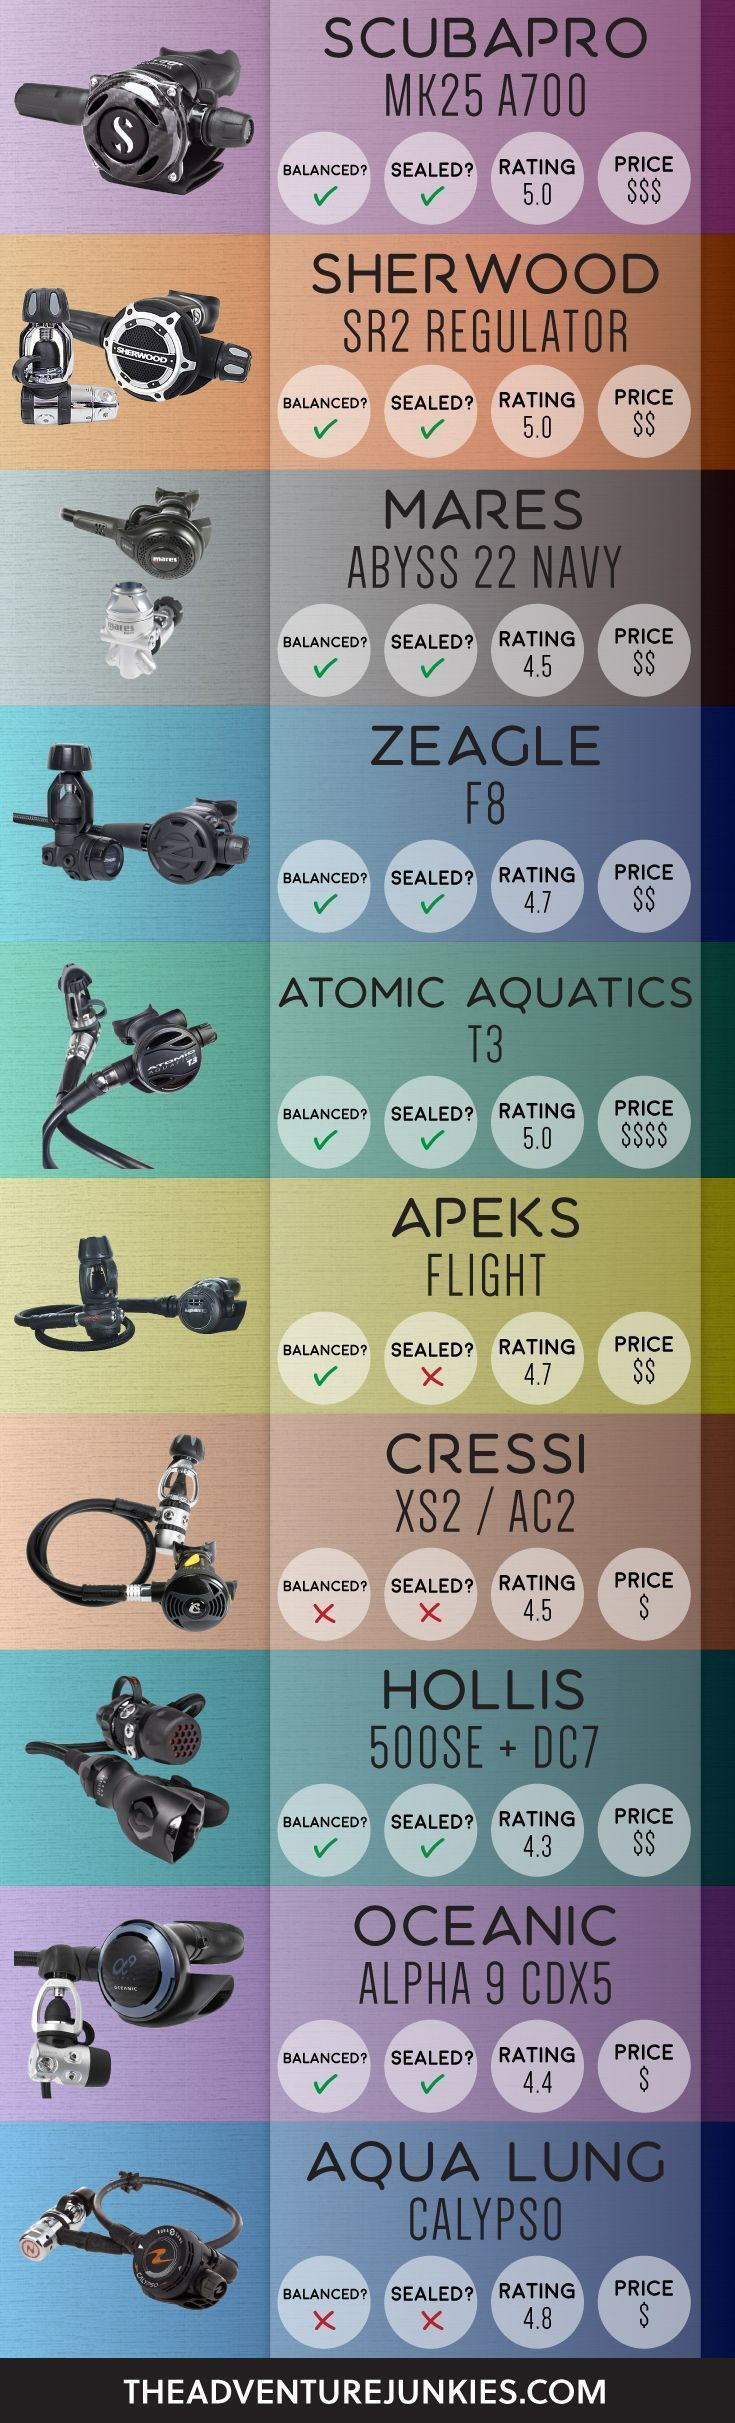 The Best Scuba Diving Regulators – Best Dive Gear - Scuba Diving Gear and Equipment Posts – Dive Products and Accessories #scubadivingadventures #scubadivingequipmentwatches #scubadivingequipmentgears